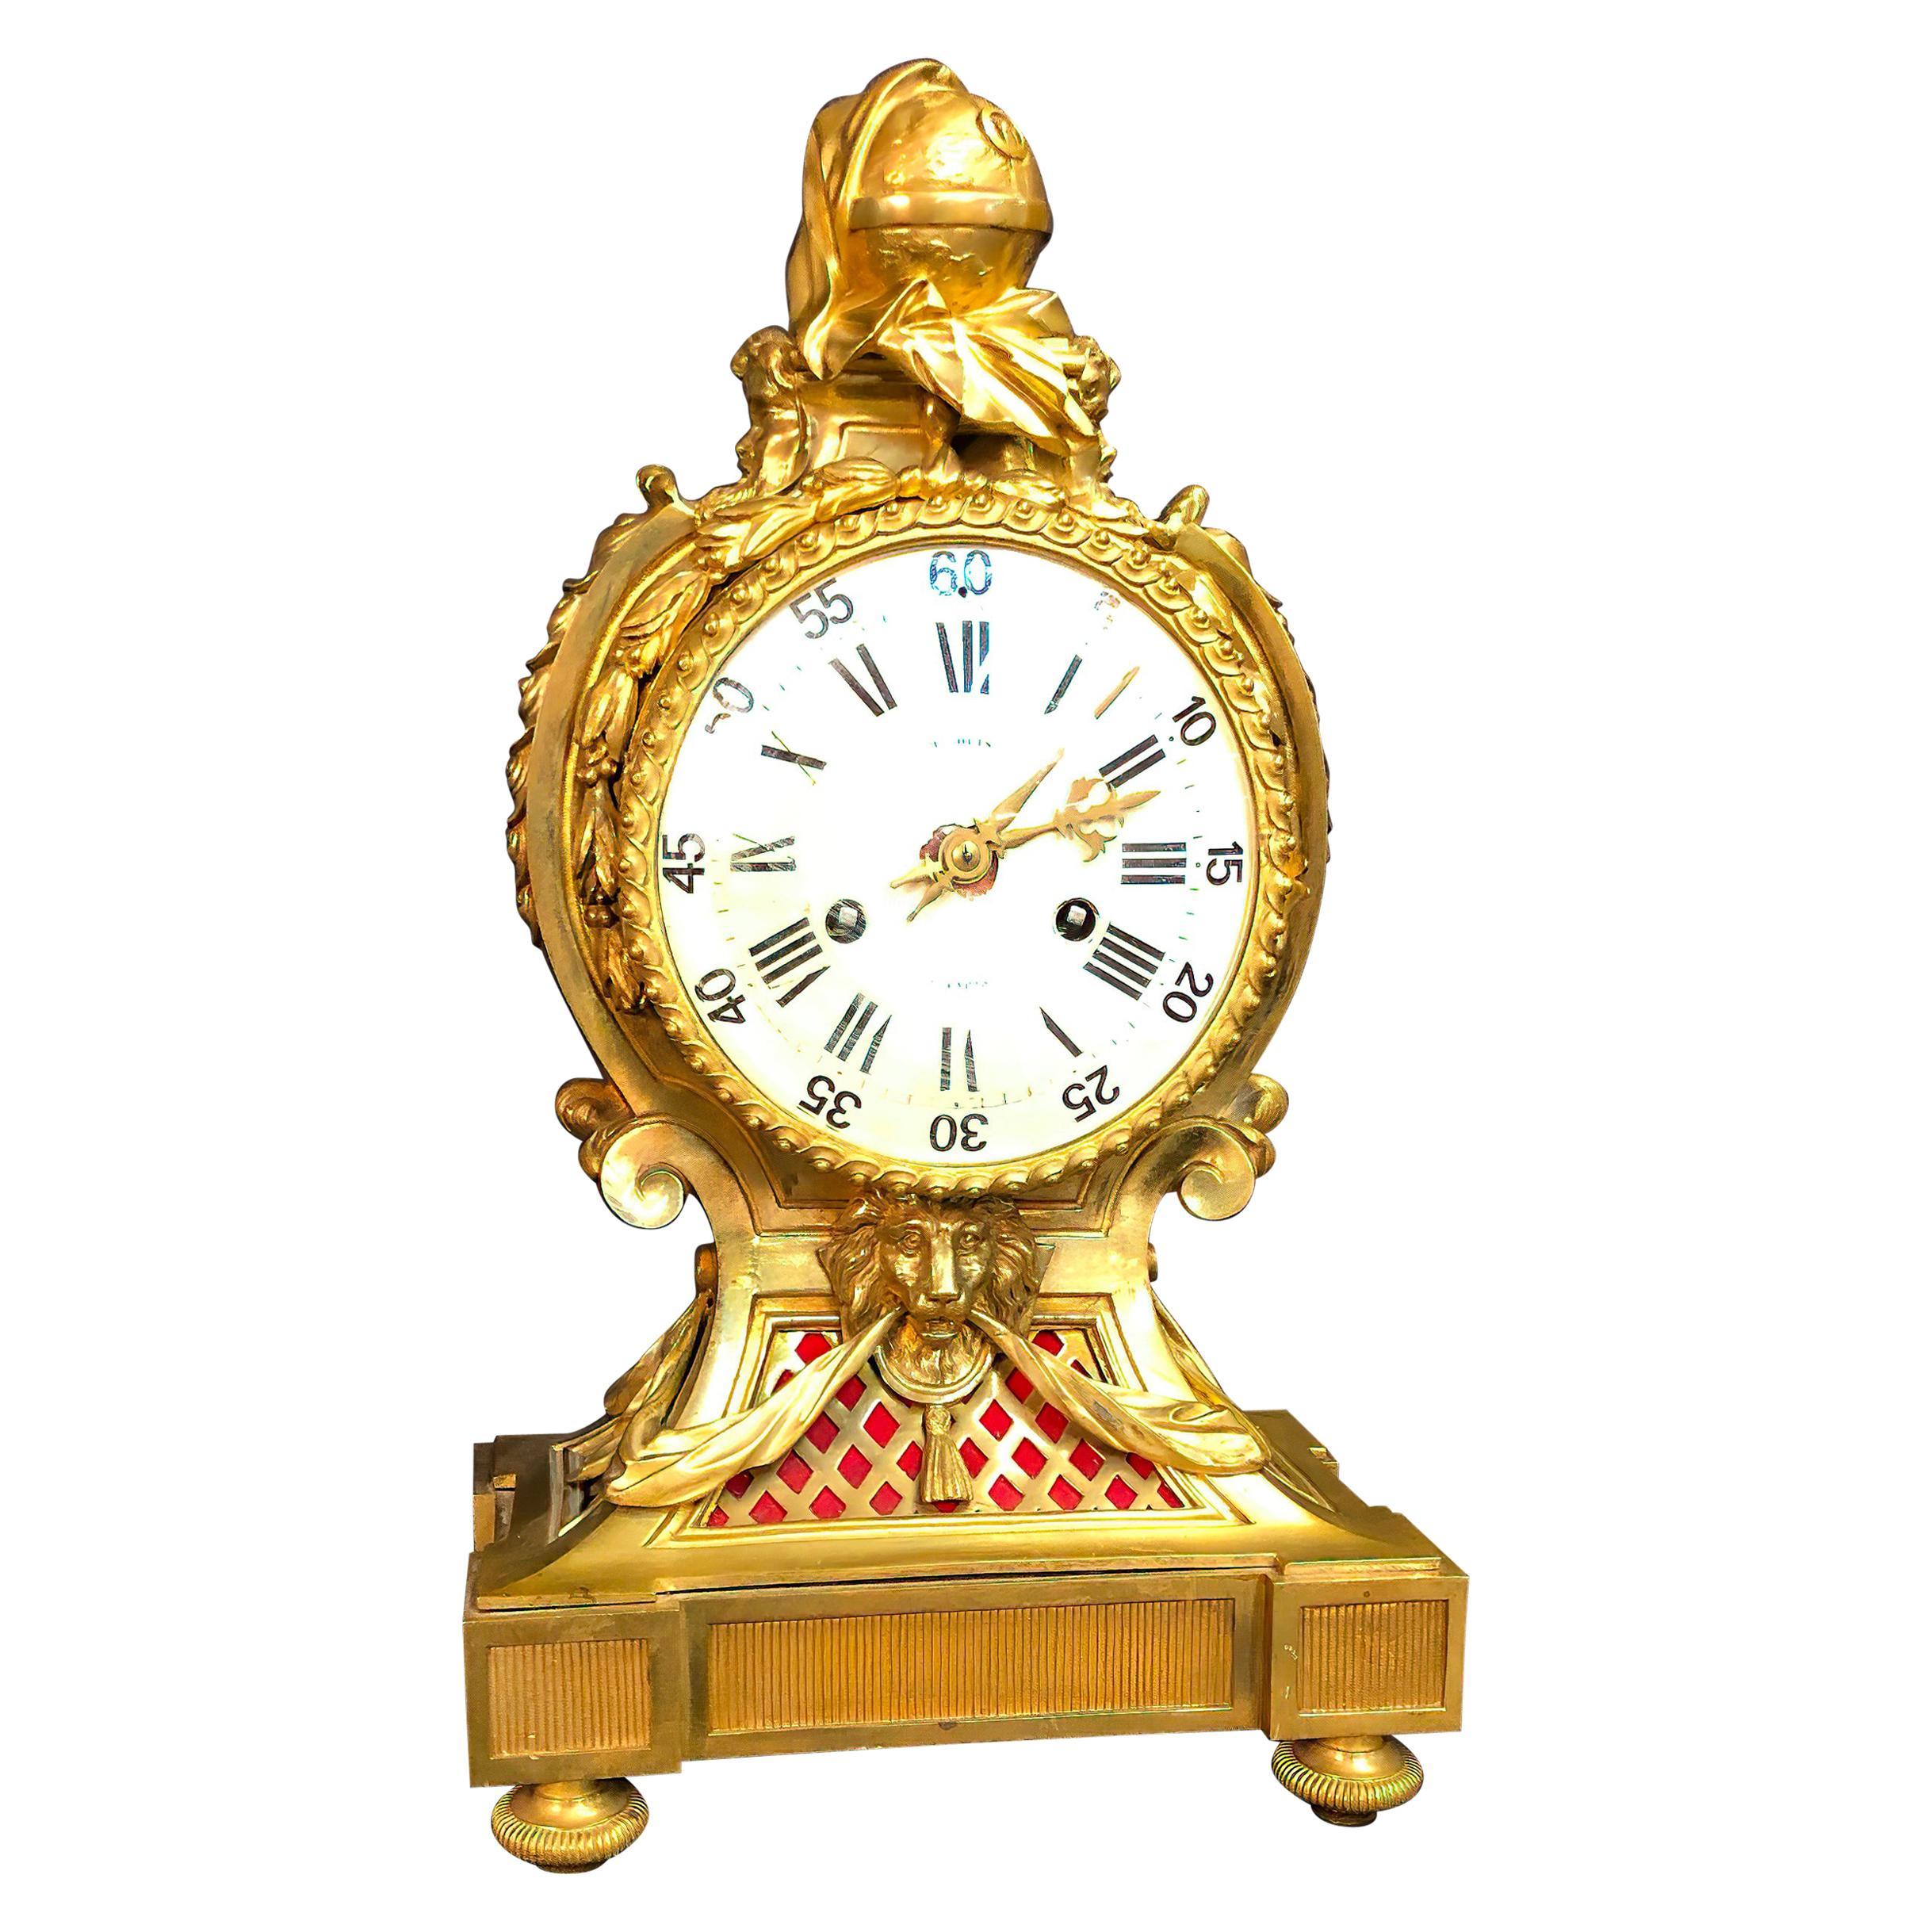 Fine French Louis XVI Bronze Mantel Clock by Marquis a Paris